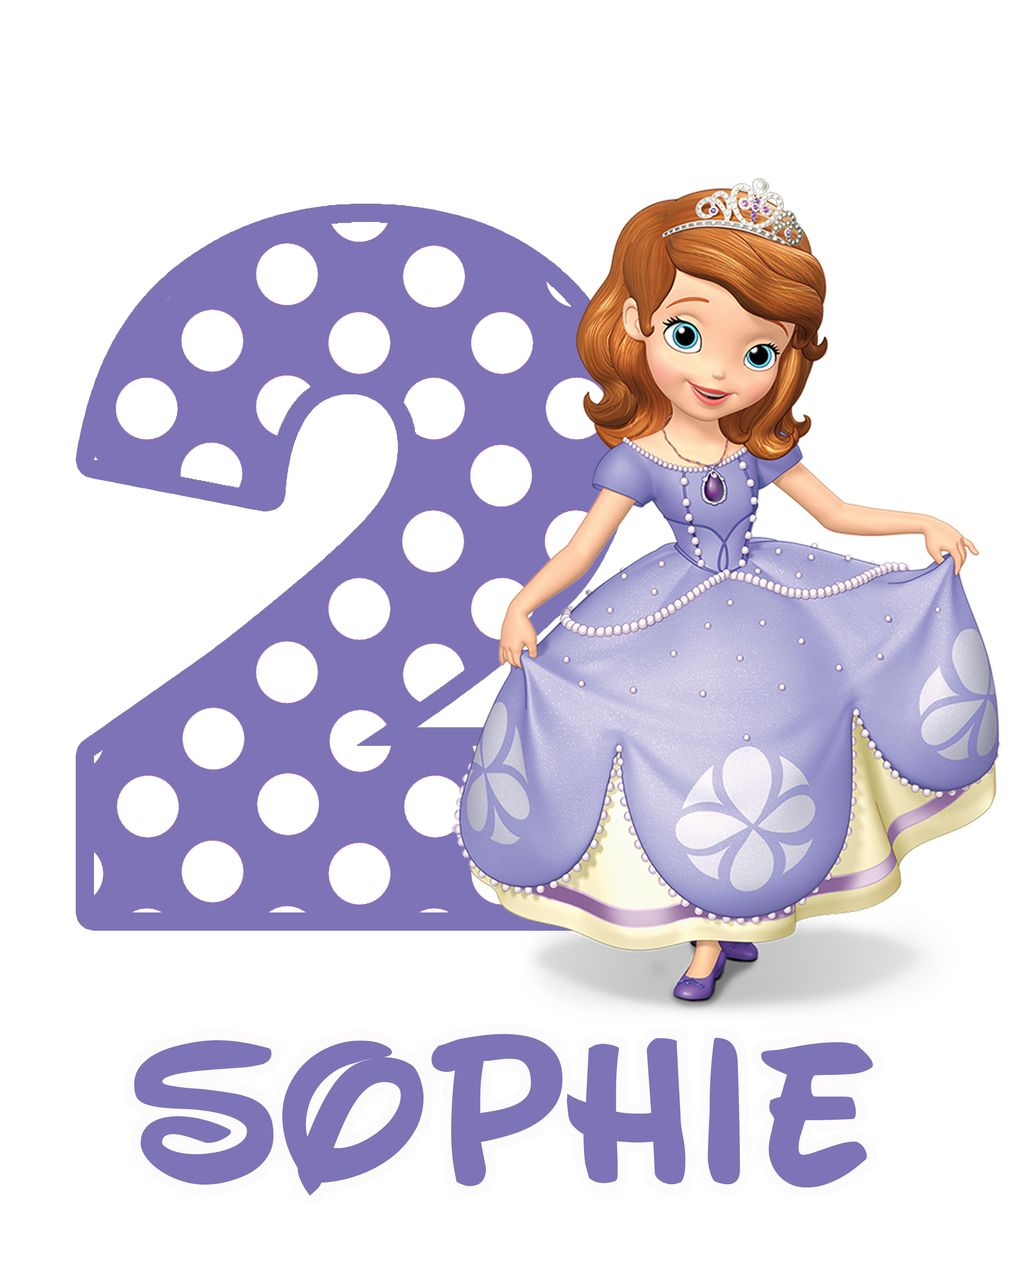 Princess Sofia the First Birthday Iron On Transfer Decal | Princess ...